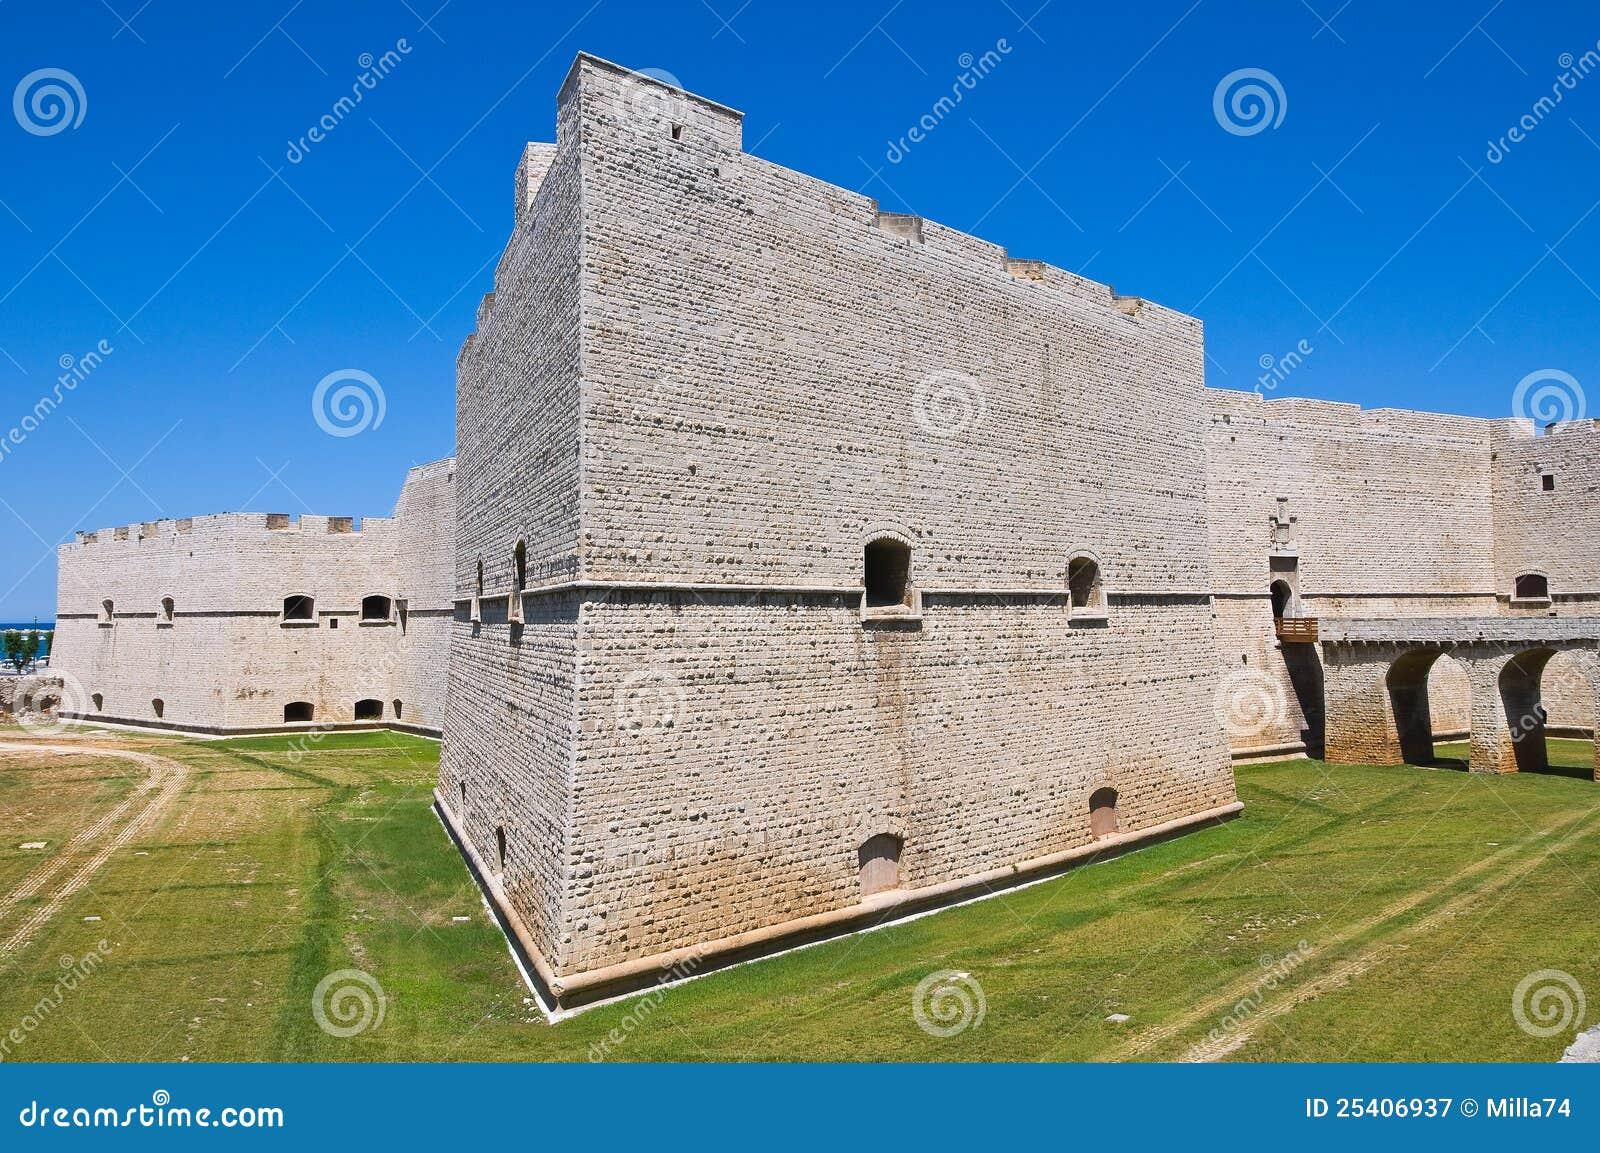 Castelo de Barletta. Puglia. Italy.